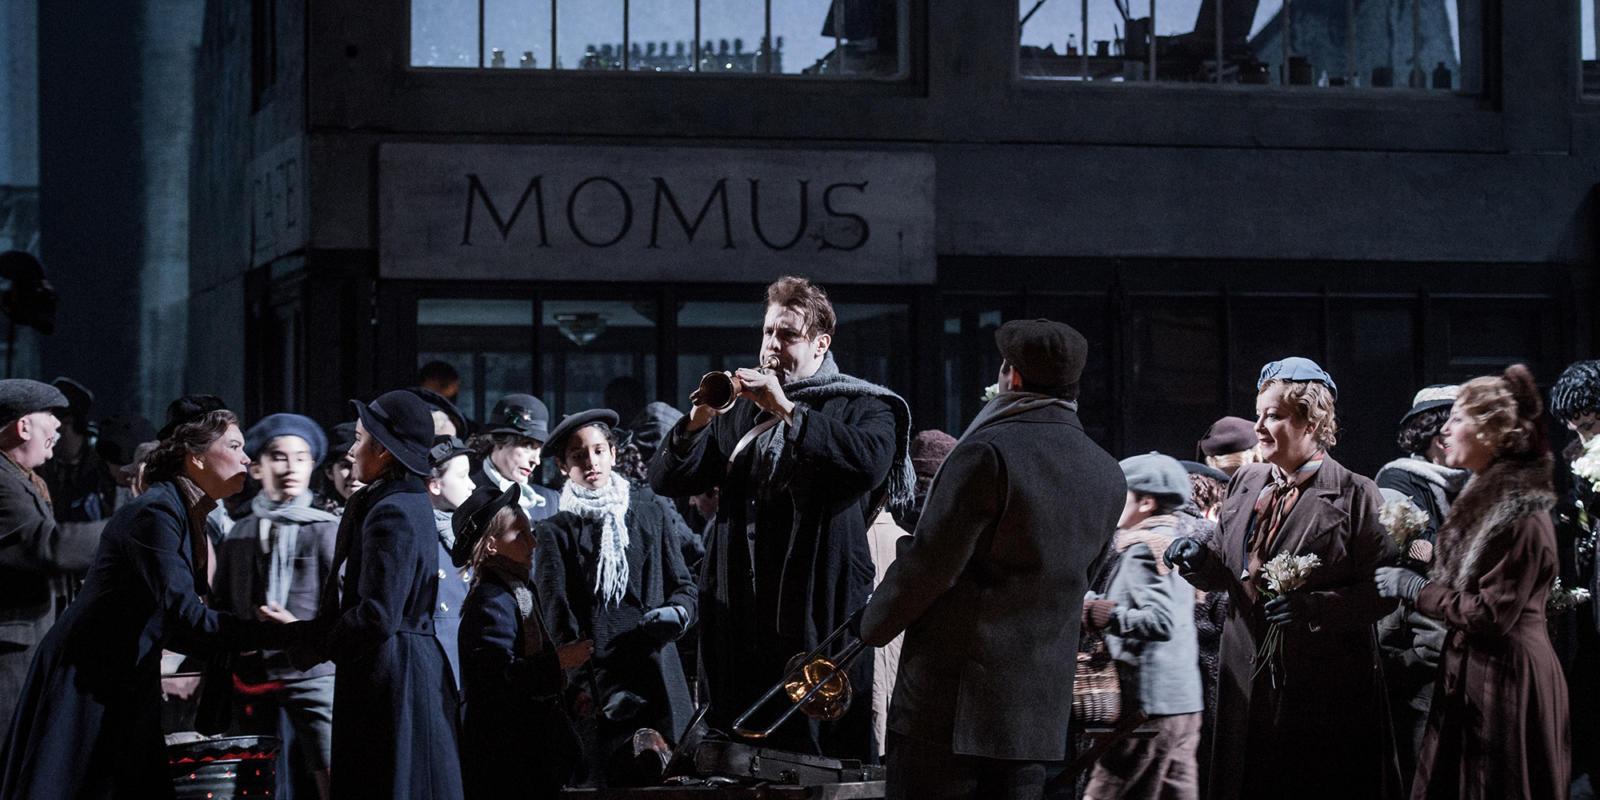 ENO La bohème: Bozidar Smiljanic and cast (c) Robert Workman